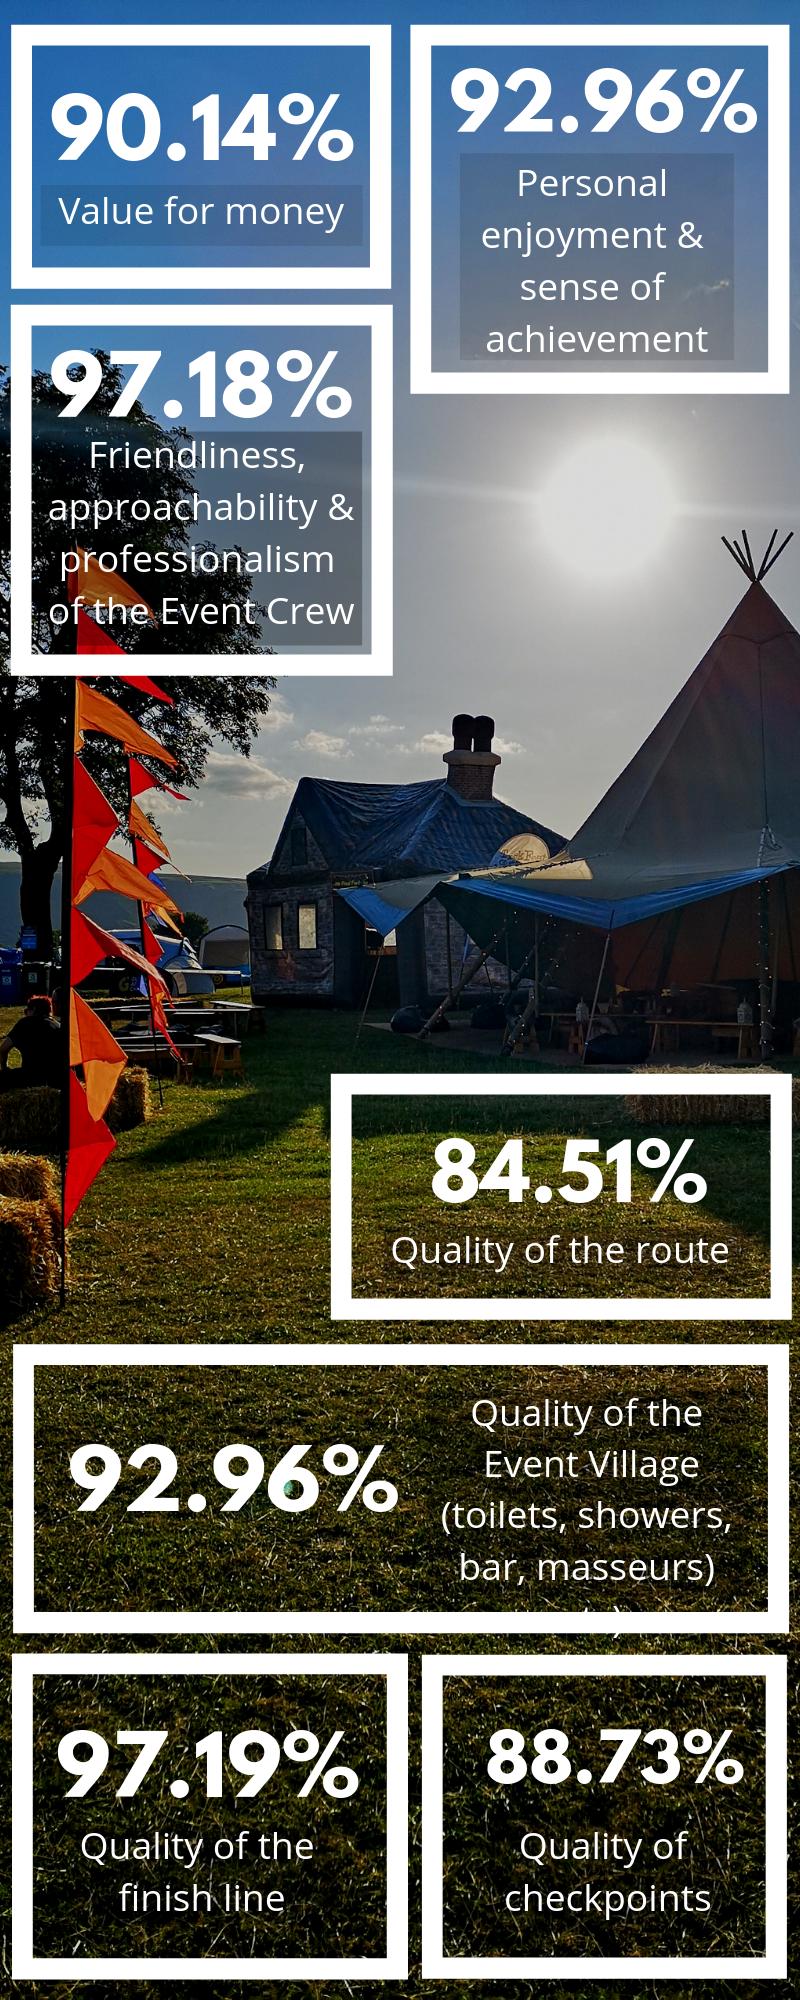 TrekFest Challenge Feedback Infographic